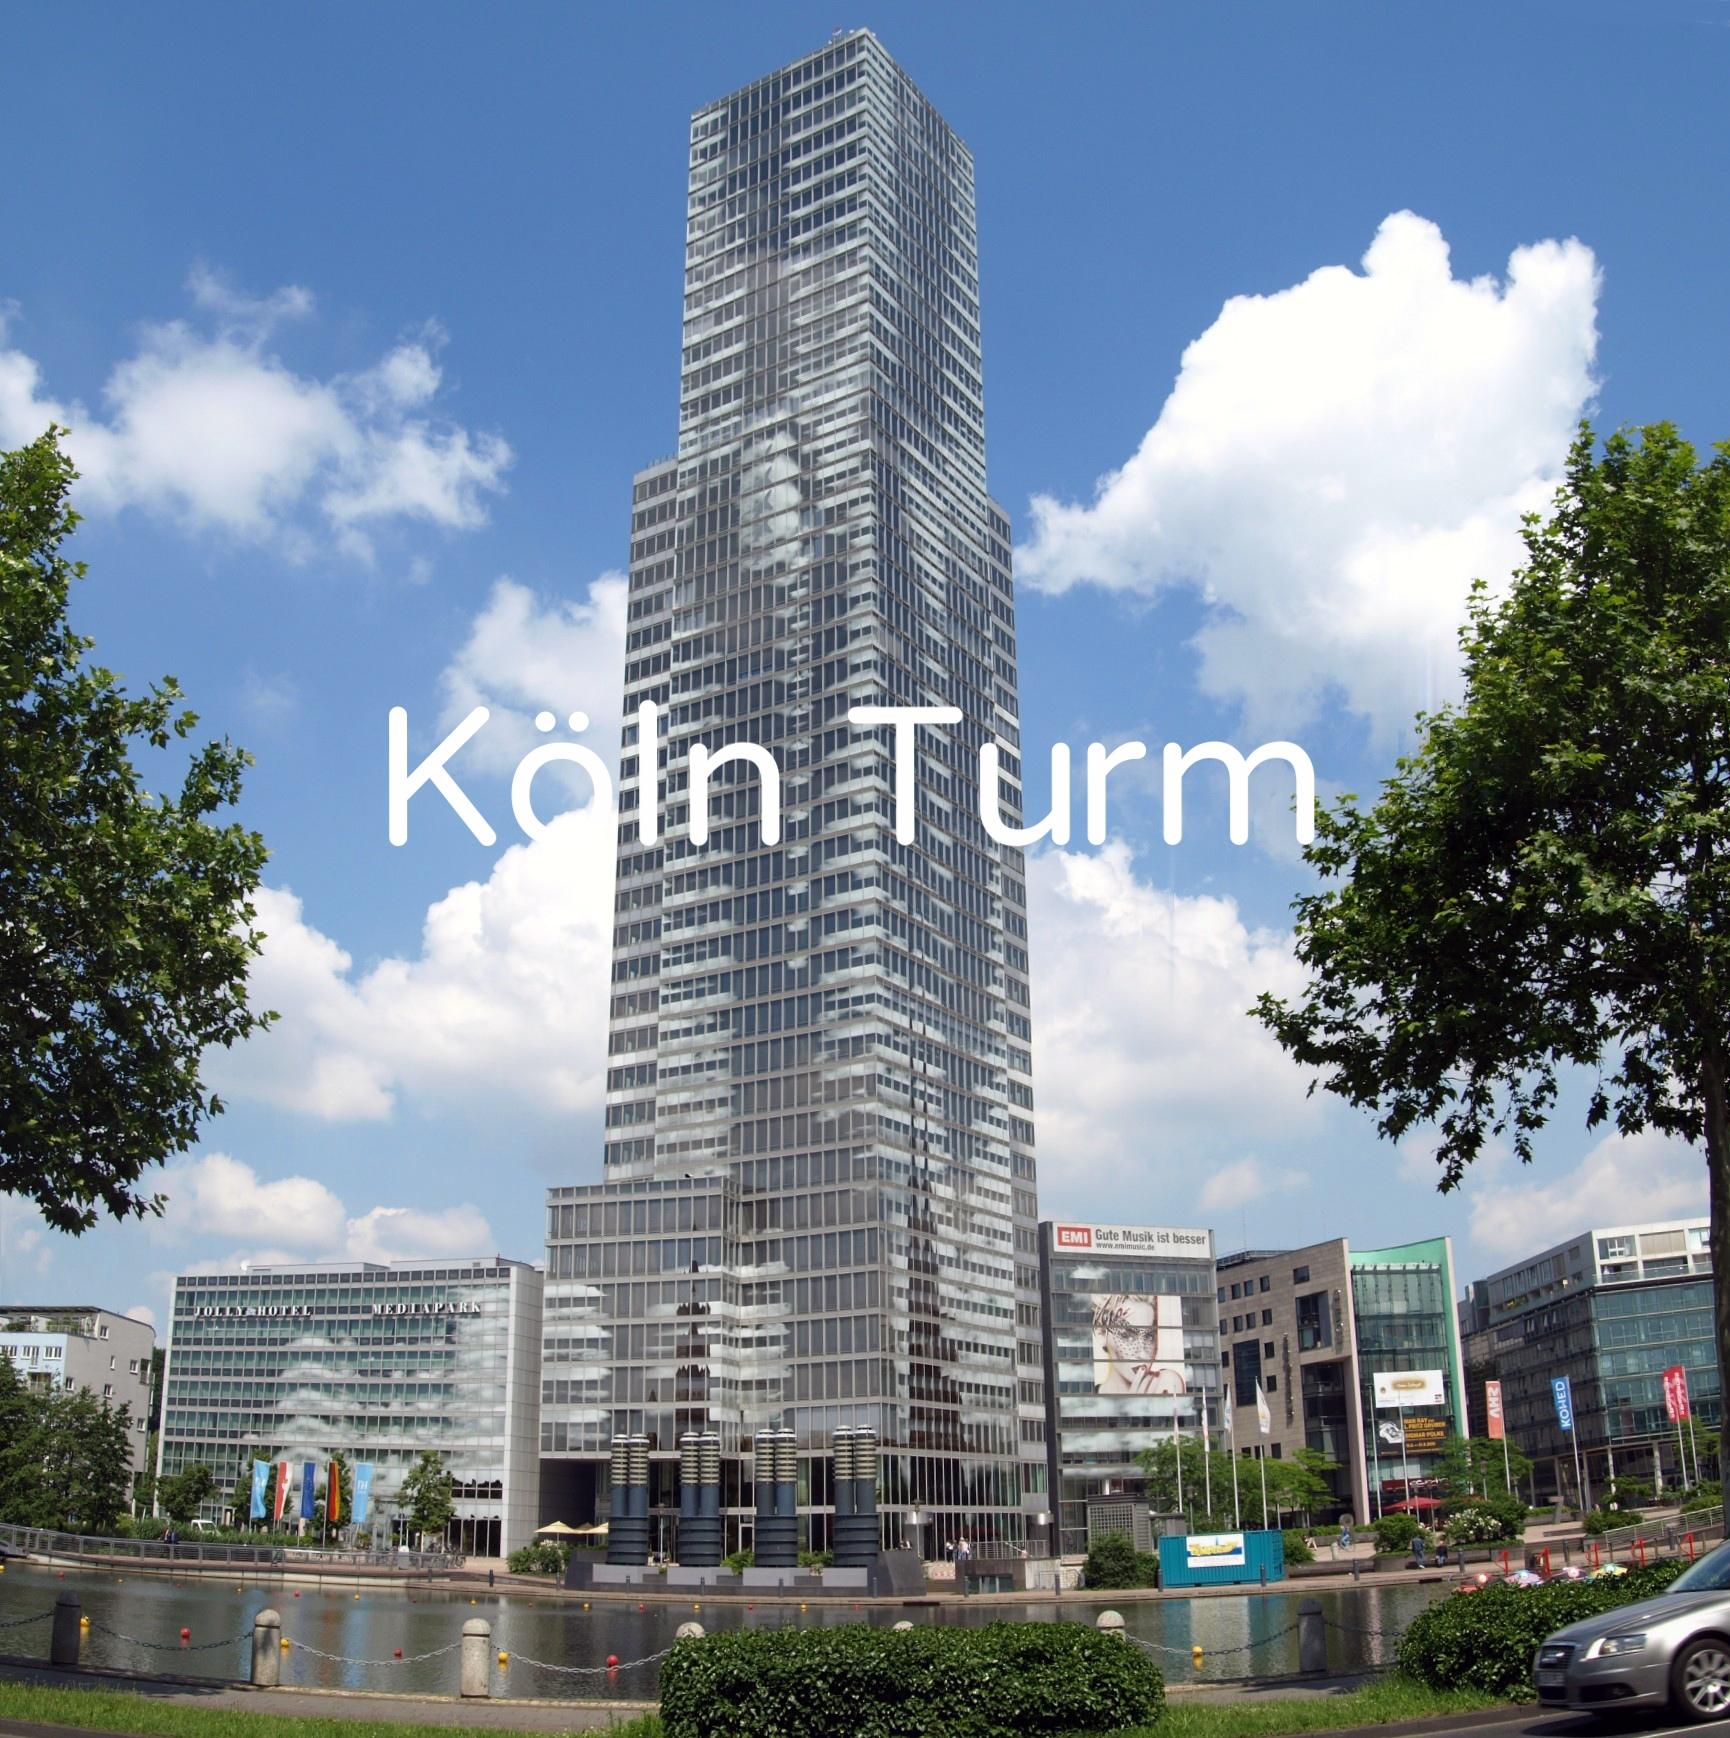 Cologne.Tower.original.22094.jpg